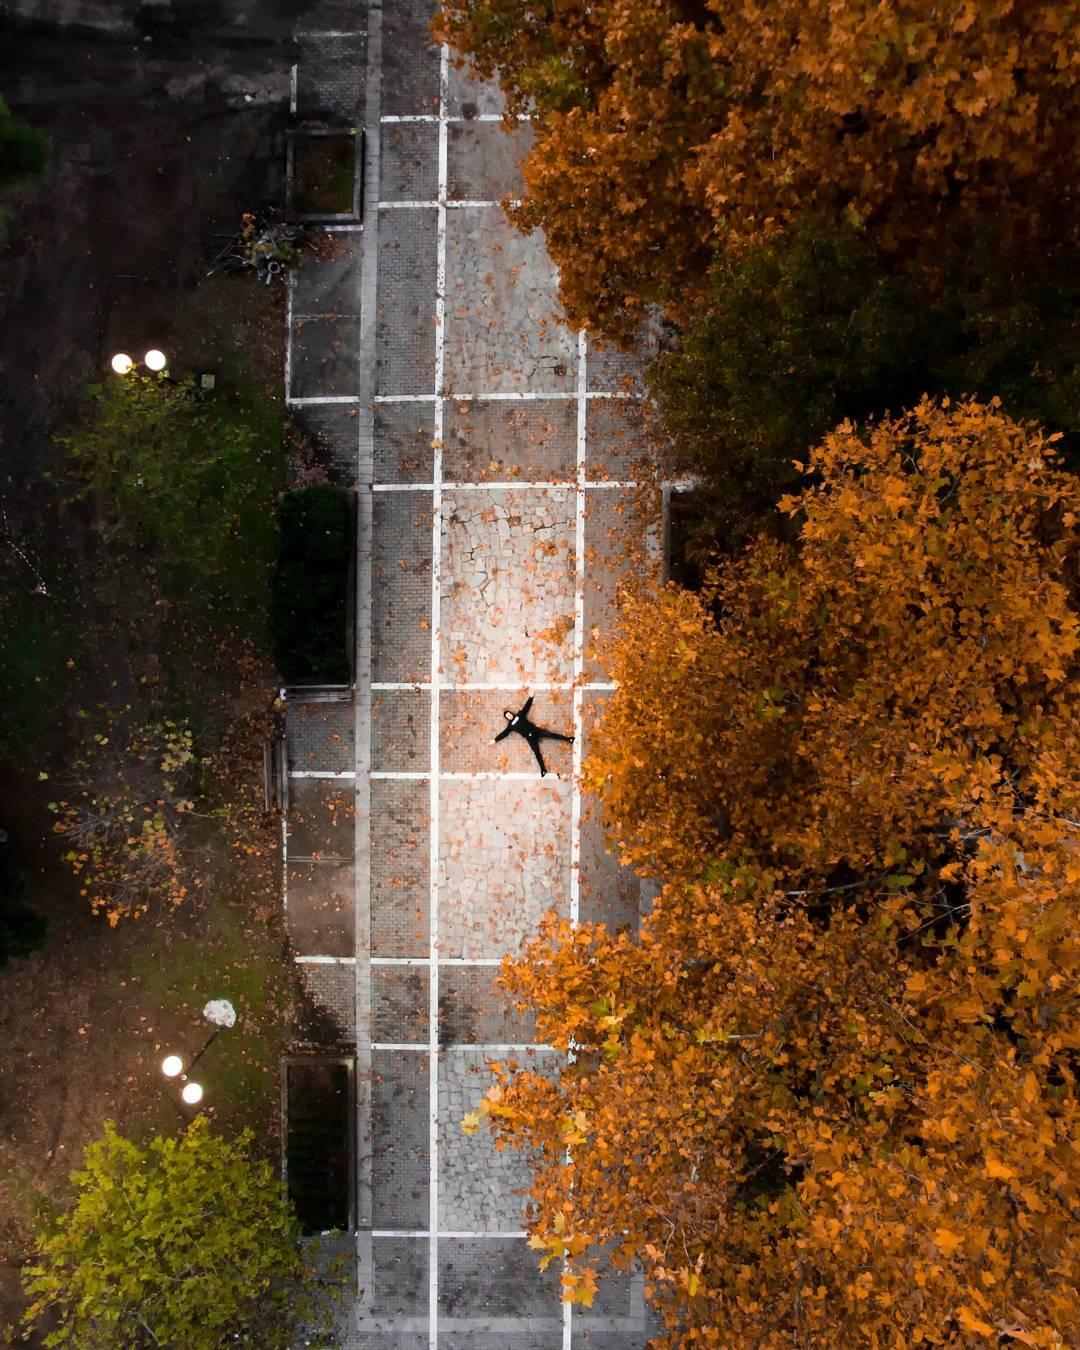 23595715 923538807800125 8027009454899724288 n - Οι εντυπωσιακές φωτογραφίες από την Λάρισα και τα παράλια της από «ψηλά»